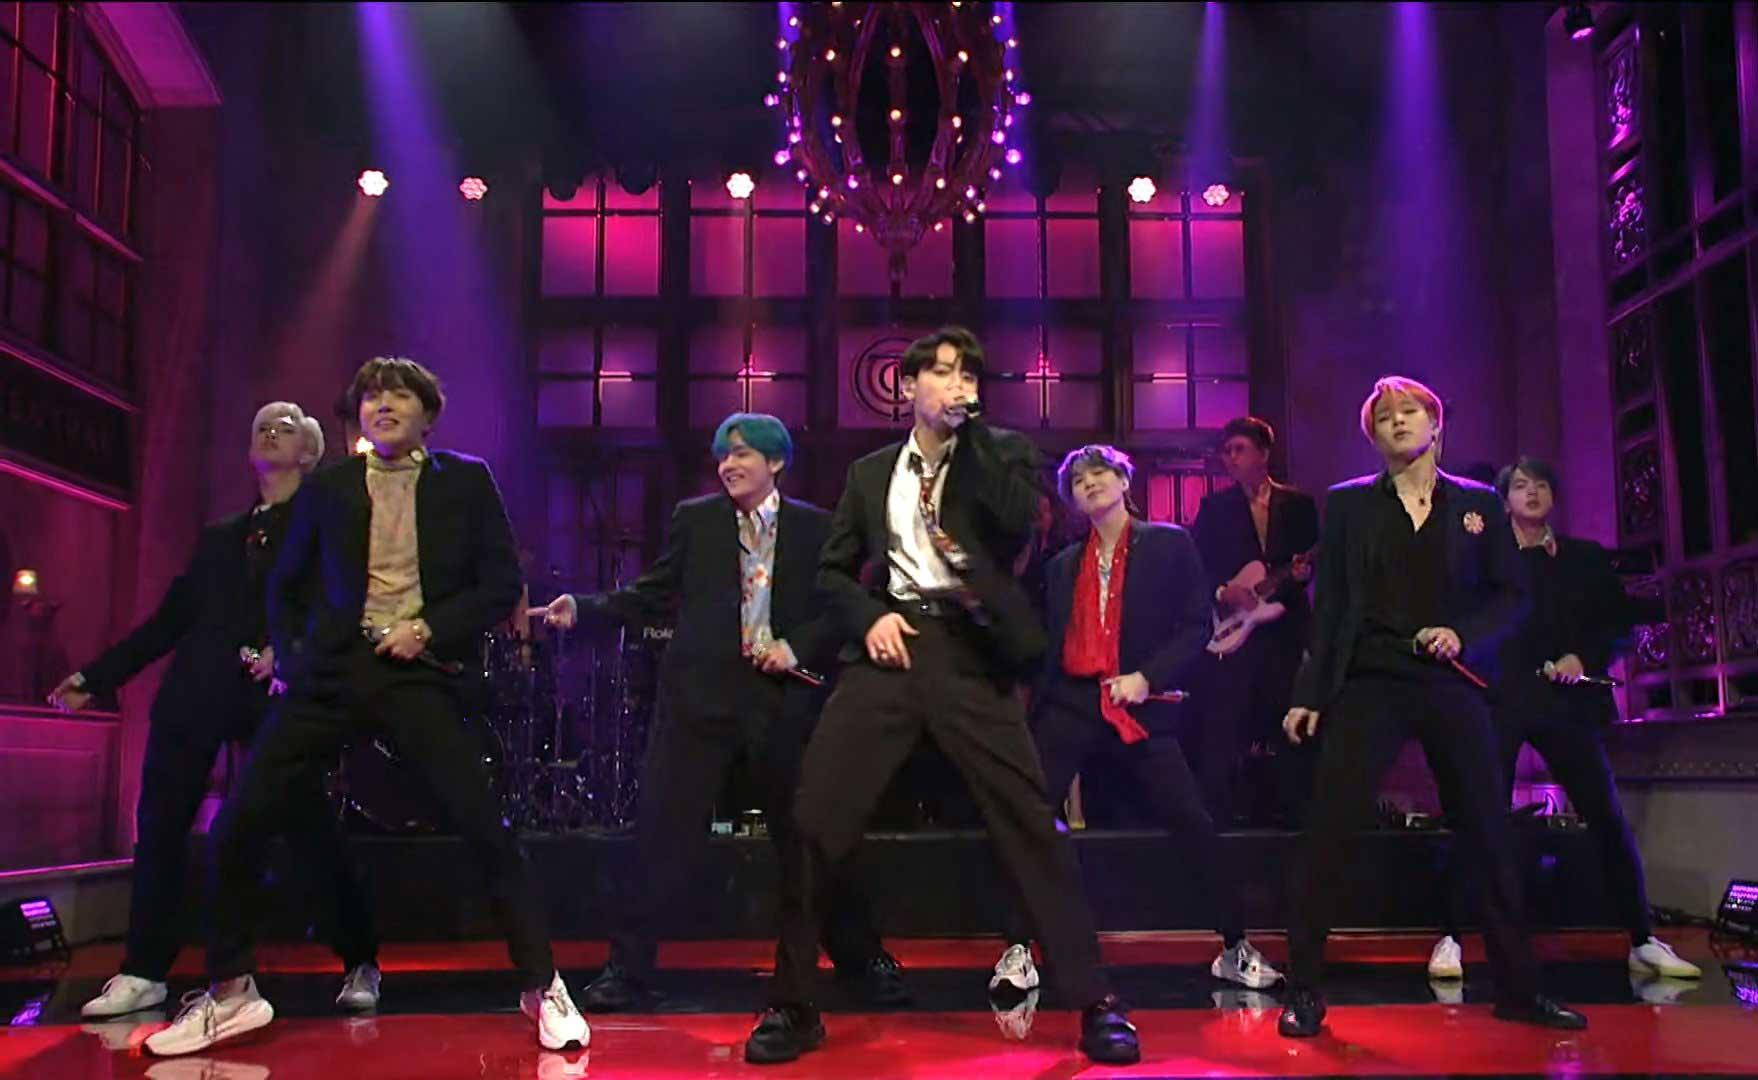 BTS исполнили «Boy With Luv» на шоу «Saturday Night Live»!